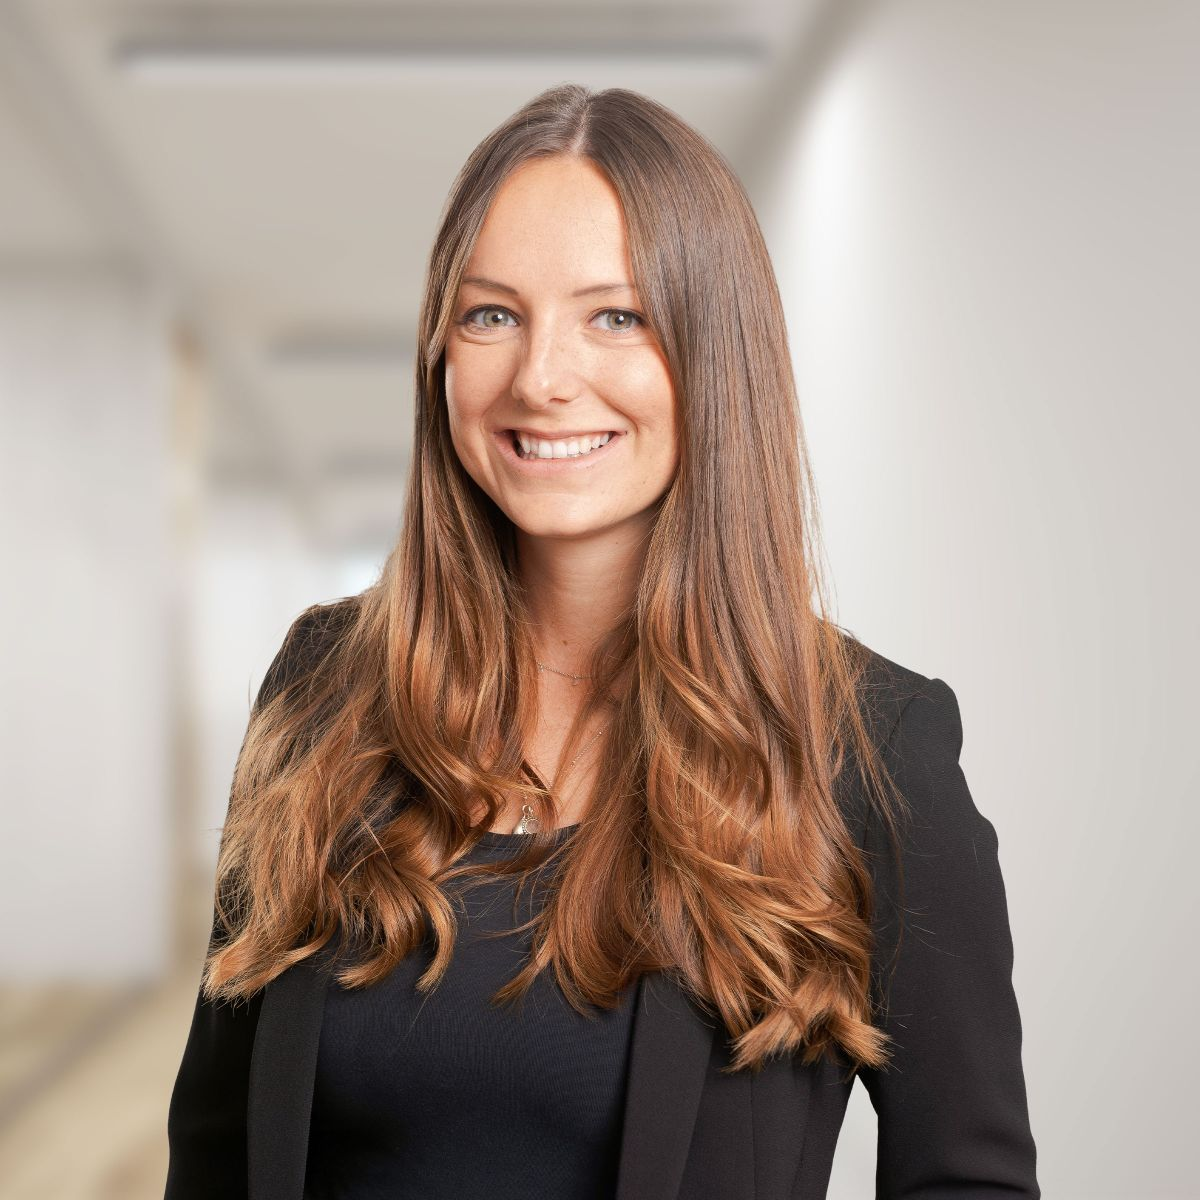 Nadine Schürch